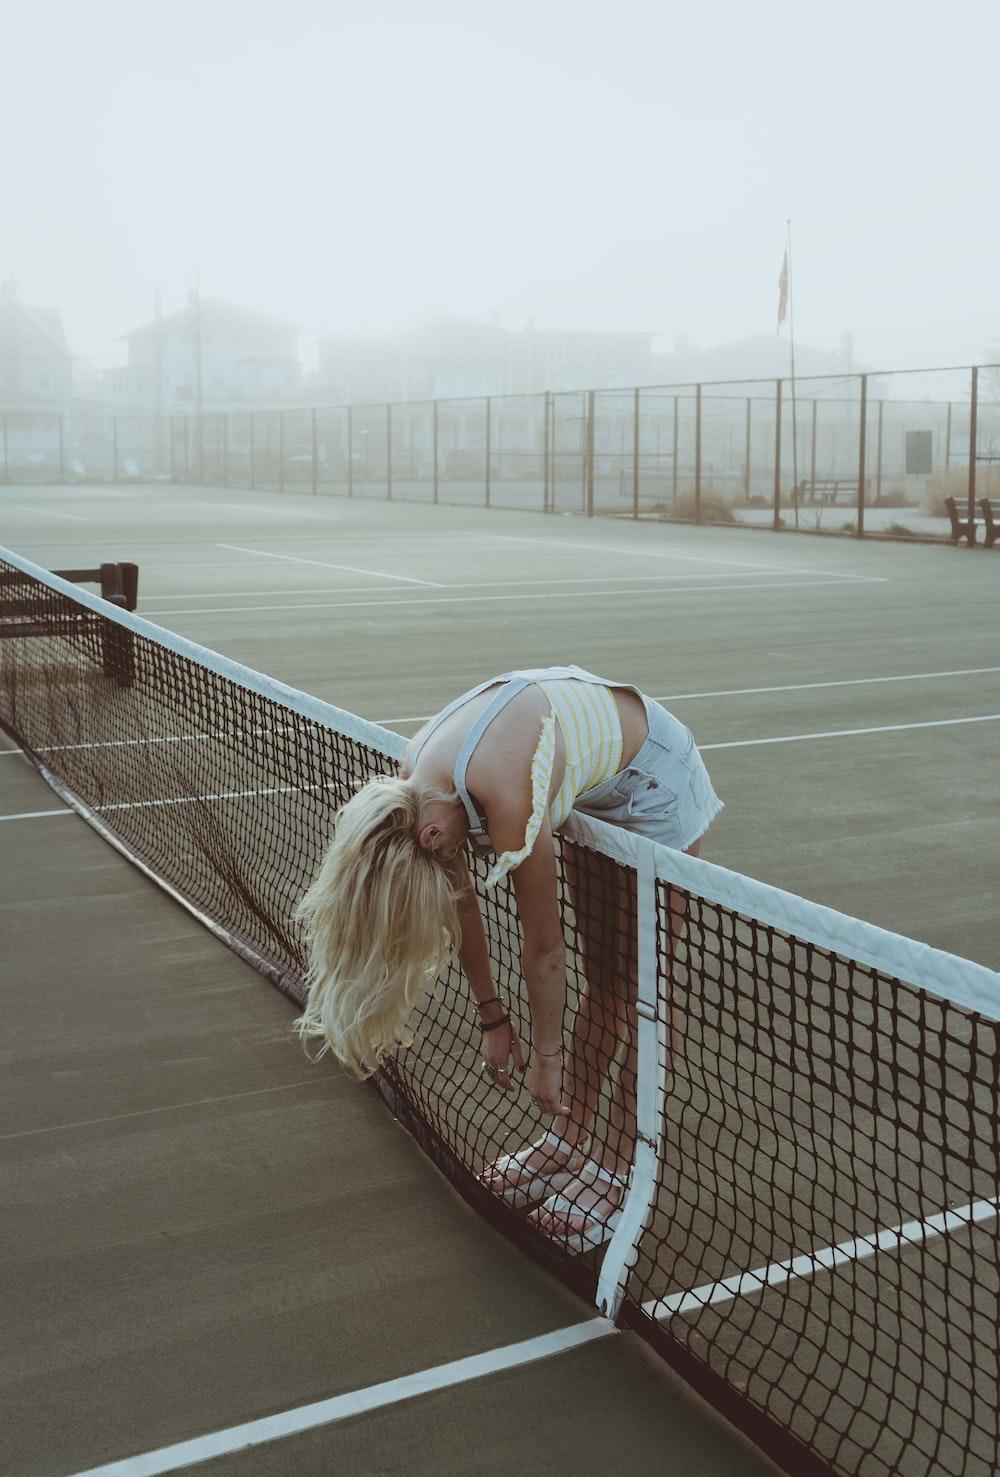 unknown person standing near tennis net